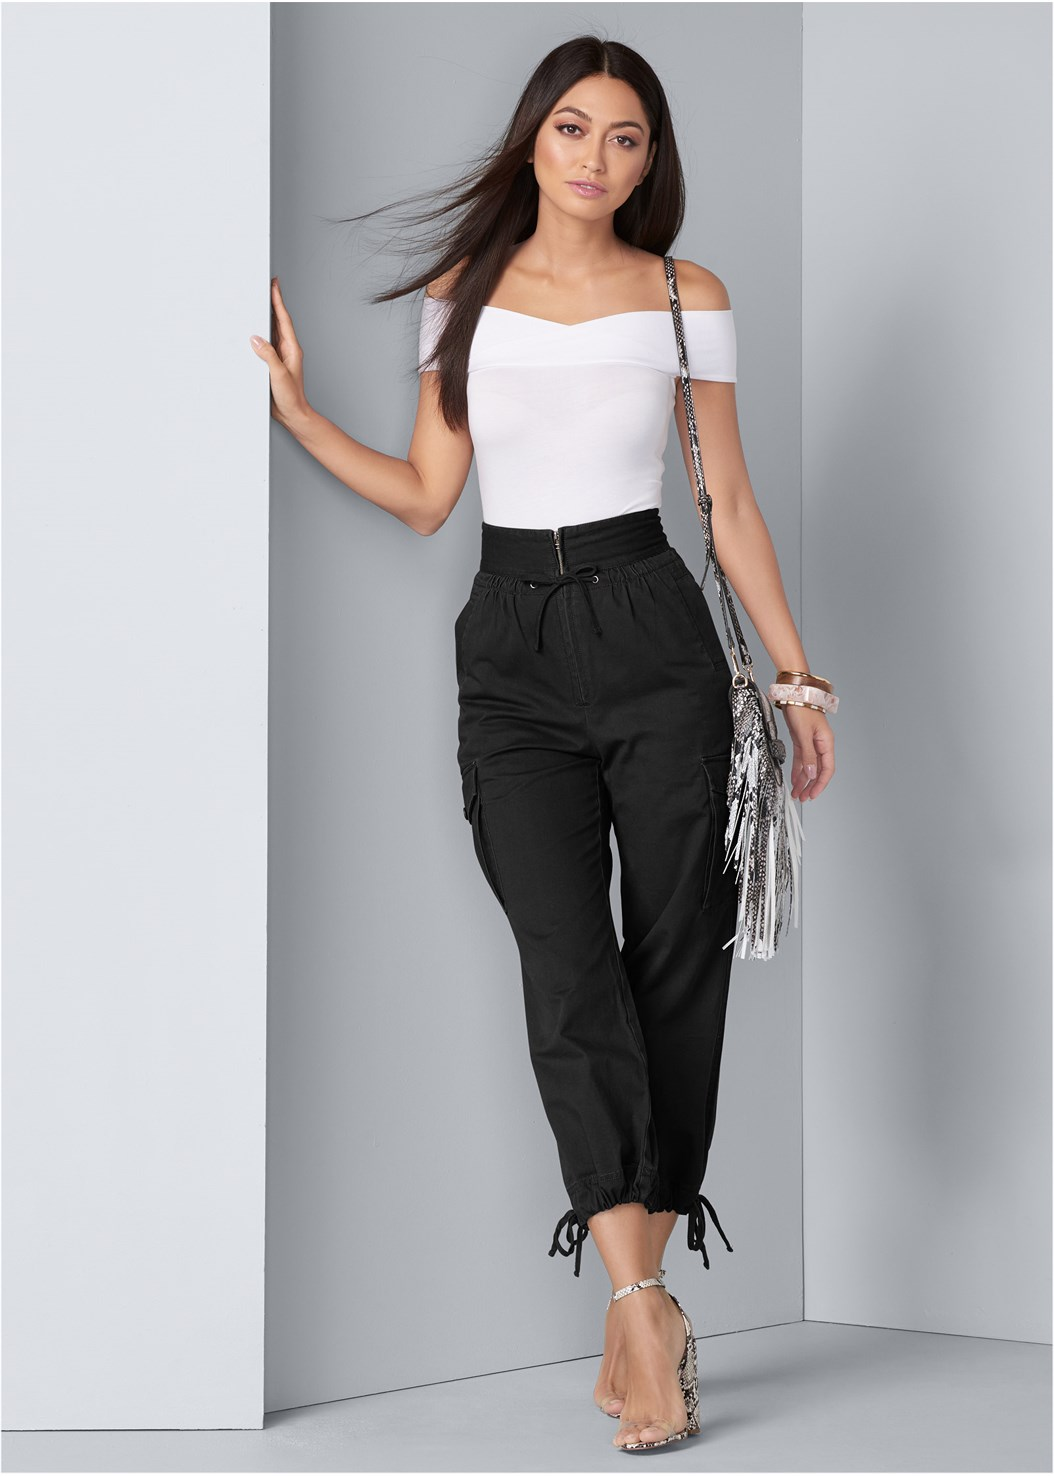 High Waisted Cargo Pants,Off The Shoulder Bodysuit,Smocked Floral Print Blouse,Lucite Detail Print Heels,Fringe Crossbody